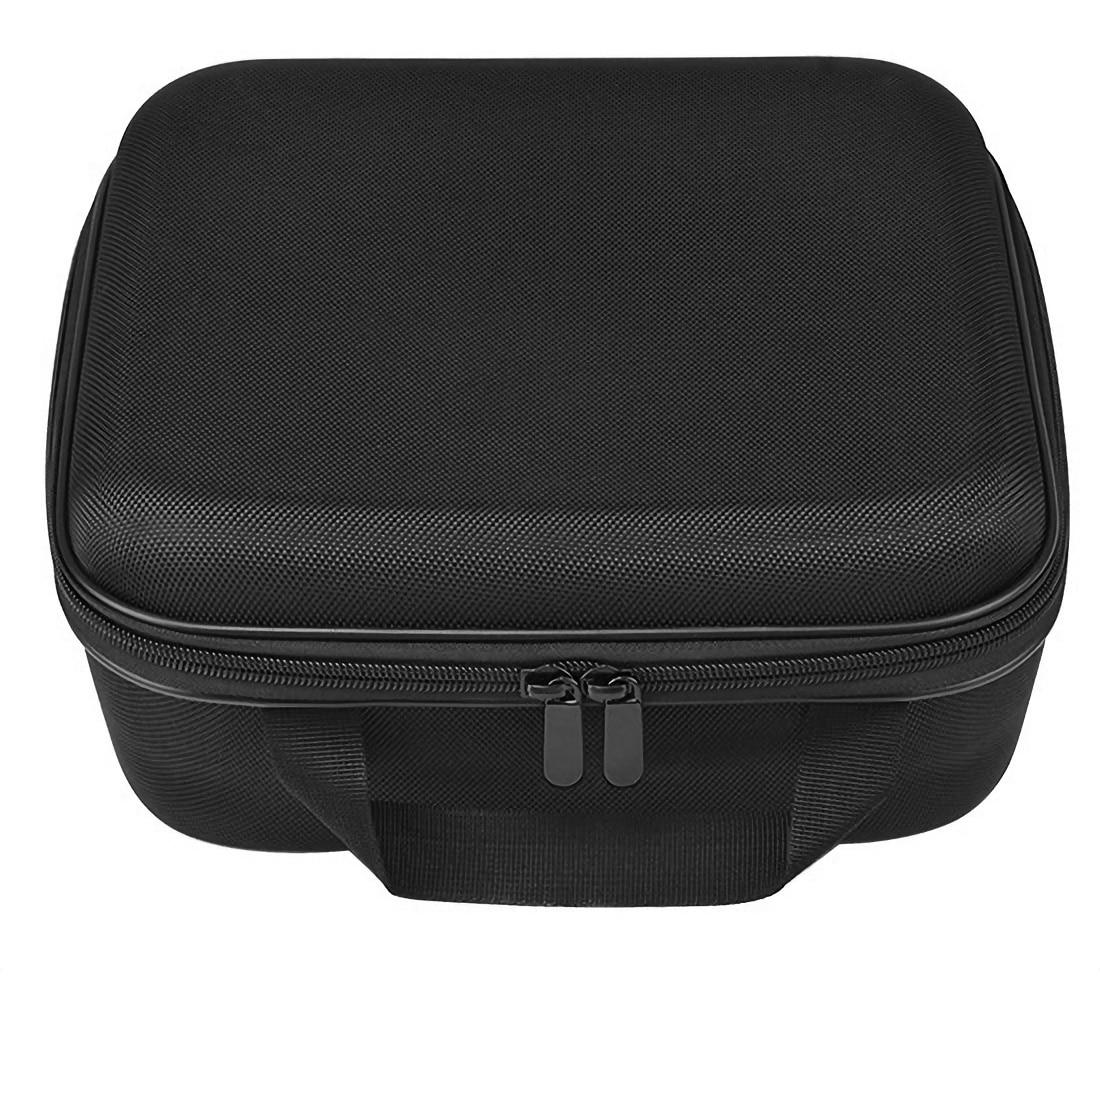 Universal Remote Controller Storage Bag RC Transmitter Protector Handbag Case Box For FrSky X9d Jumper T16 FUTABA T14SG AT9S